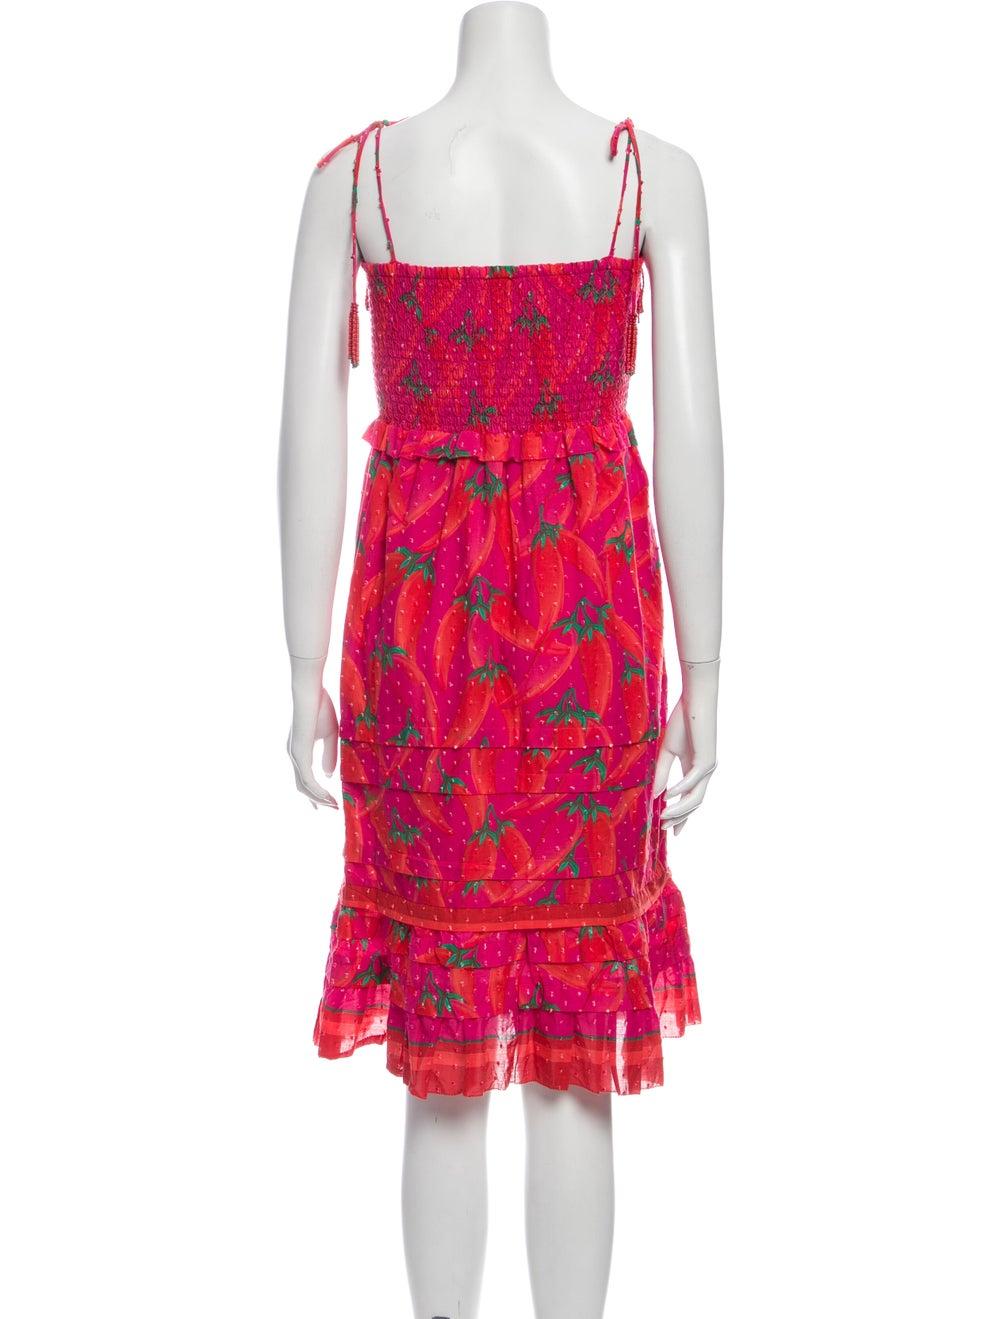 Farm Rio Floral Print Mini Dress Pink - image 3